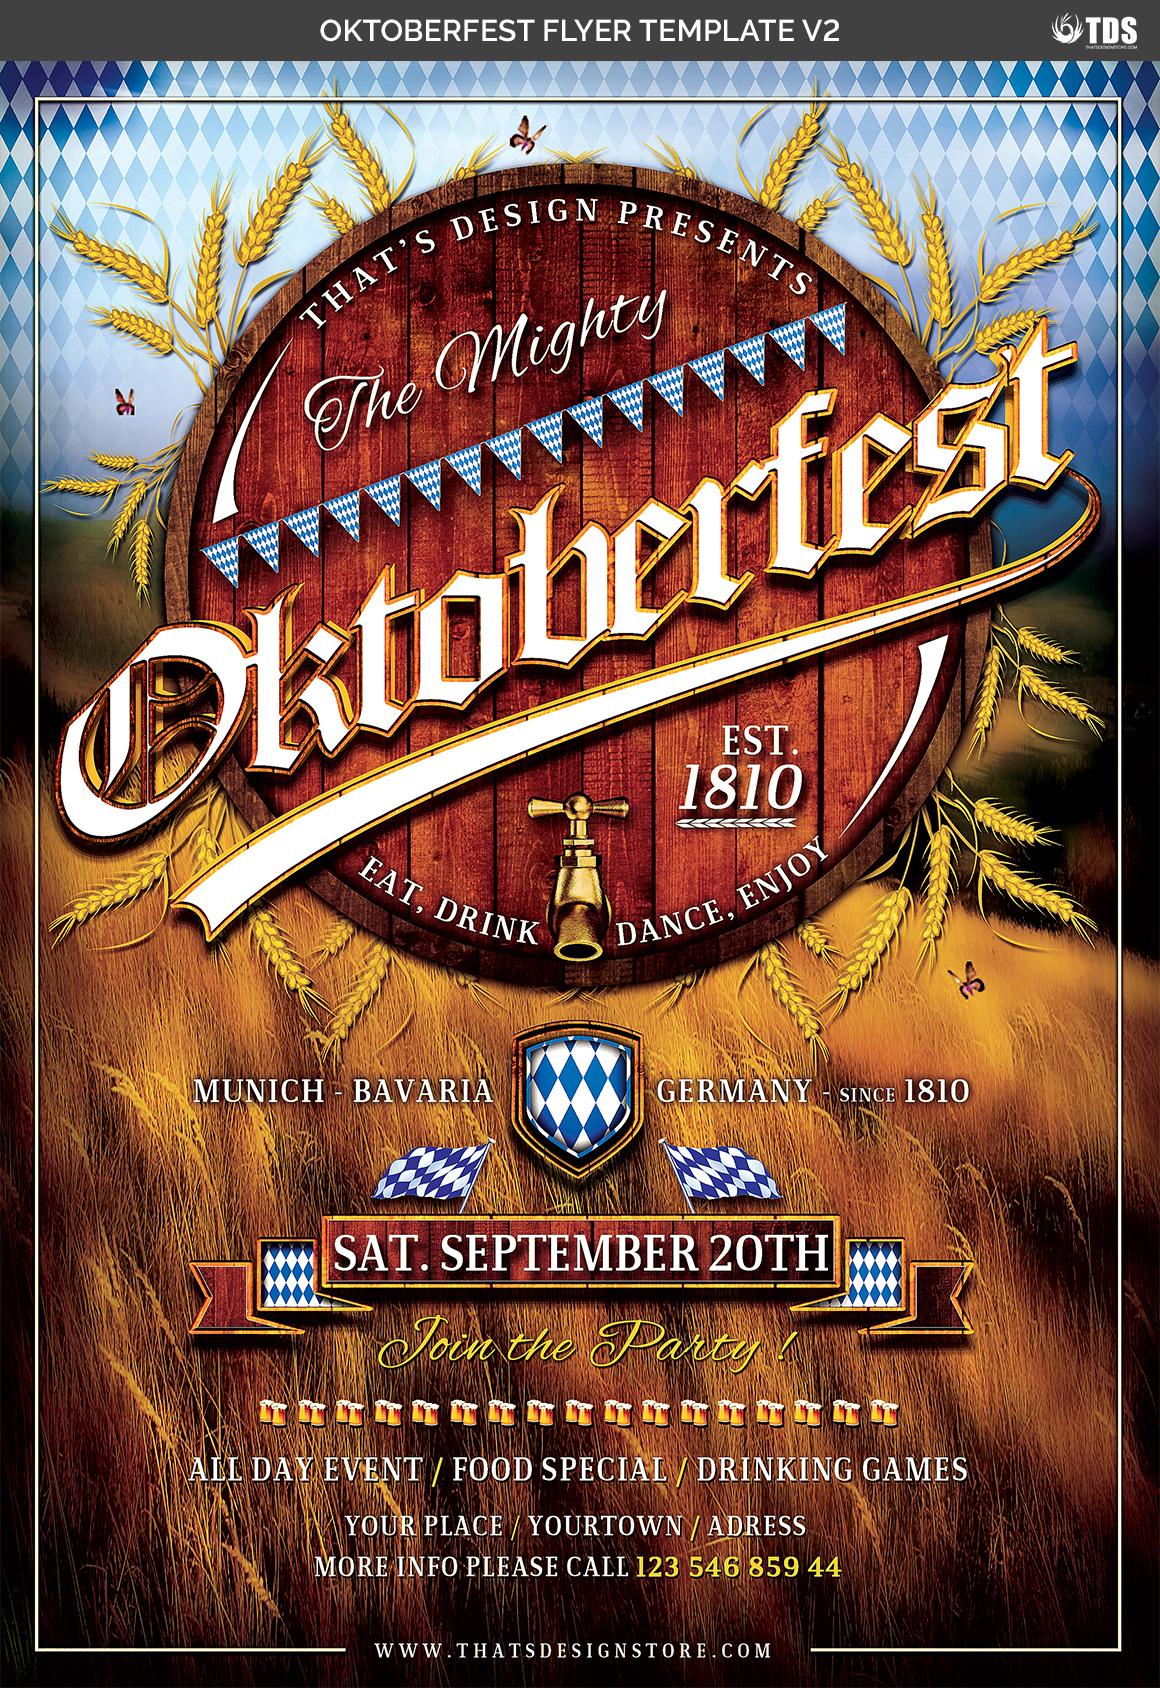 Oktoberfest Flyer Template V2 example image 8